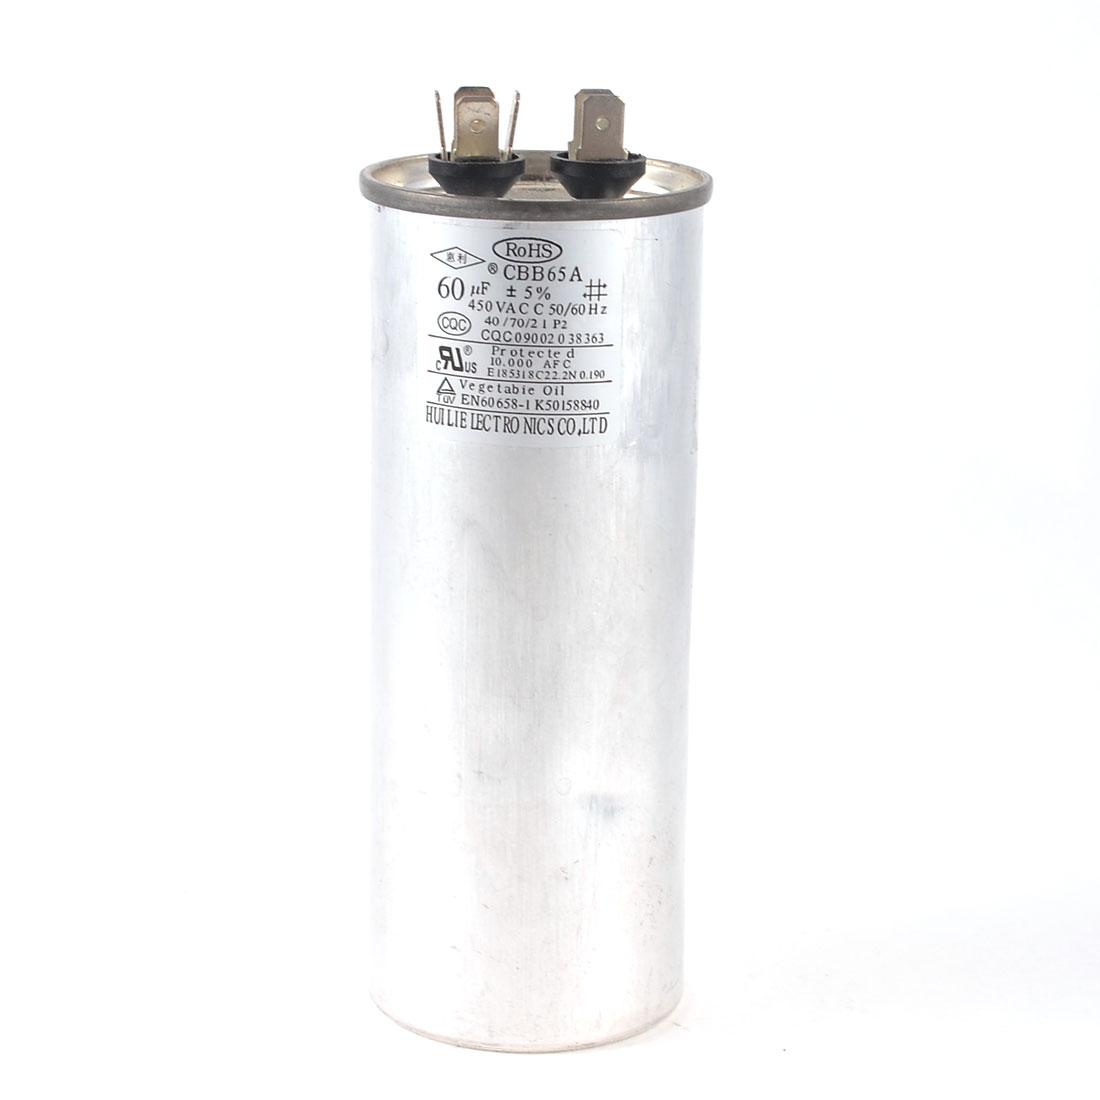 450VAC 60uF 5% Lug Terminal Cylindrical Motor Running Capacitor CBB65A